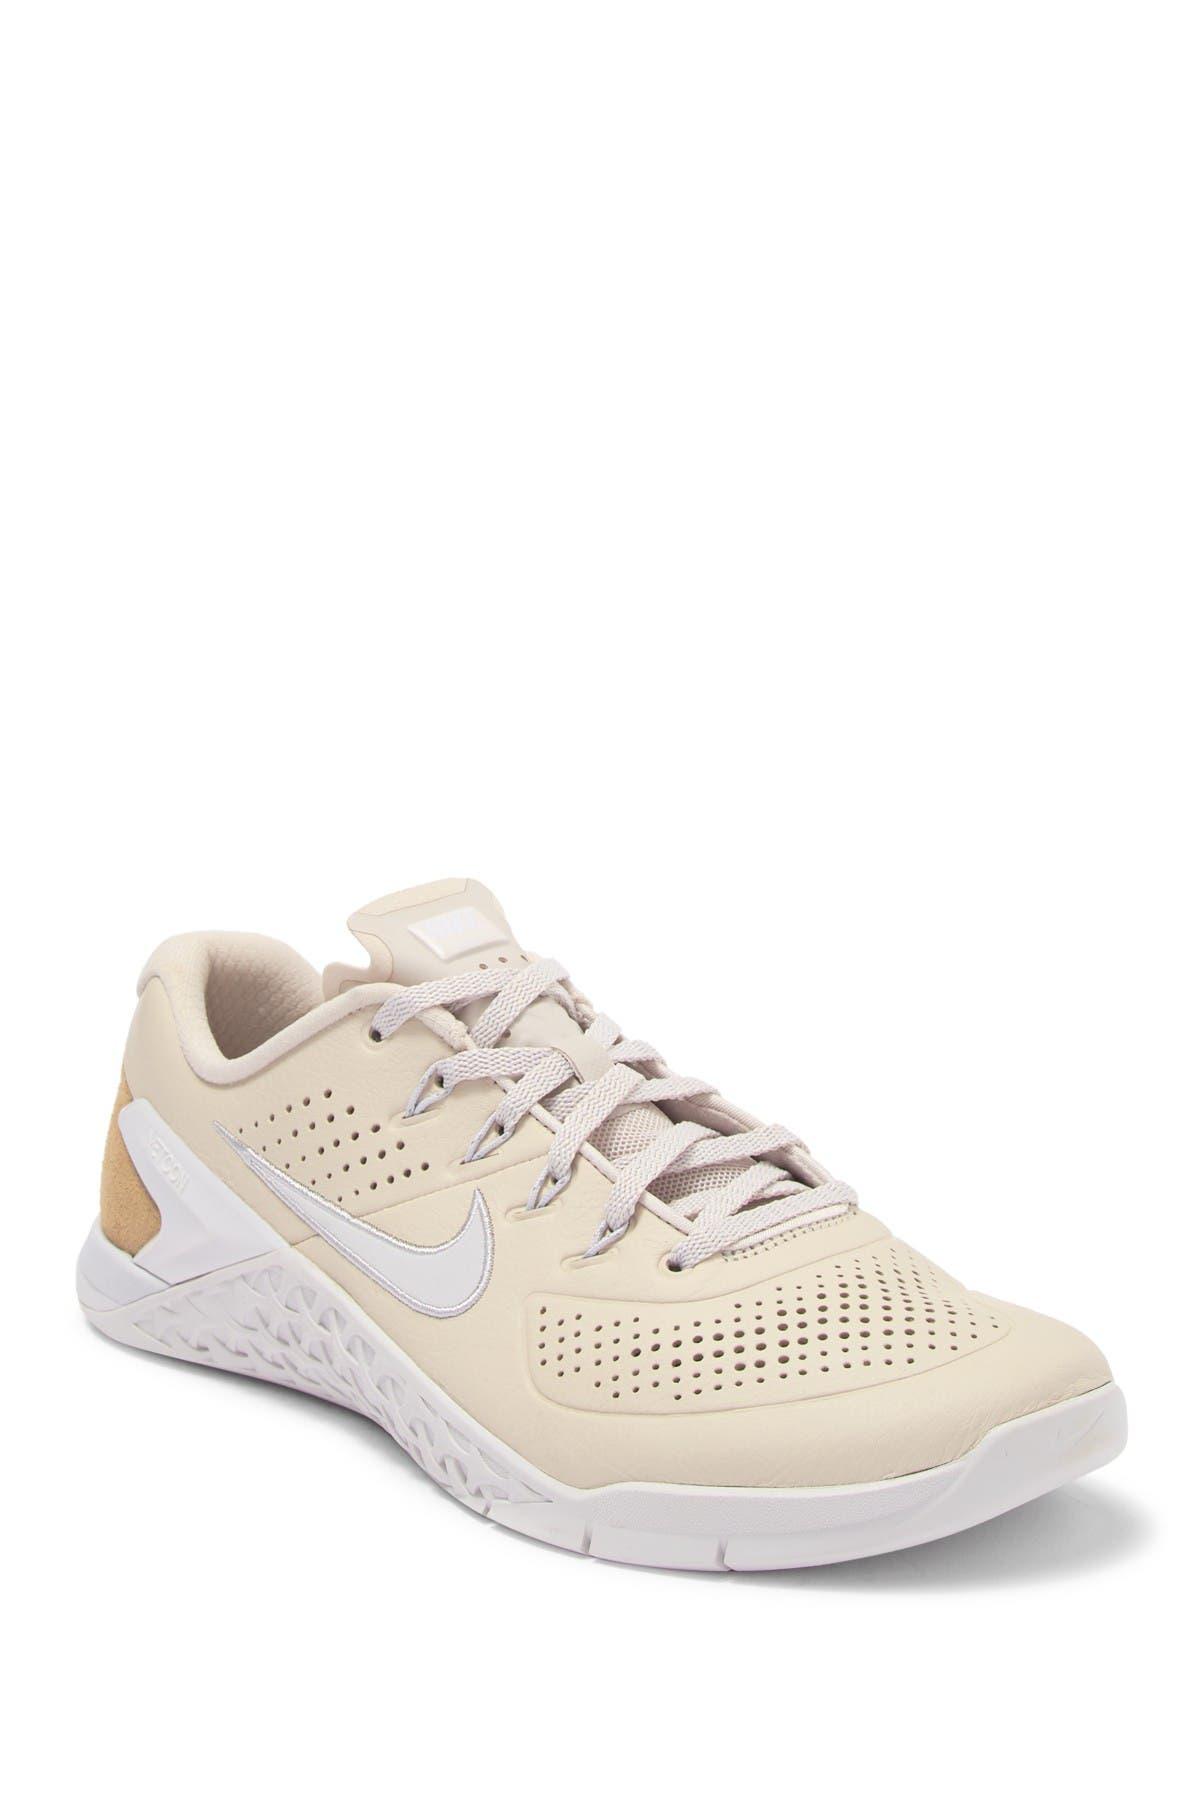 Nike | Metcon 4 Amp Leather Sneaker